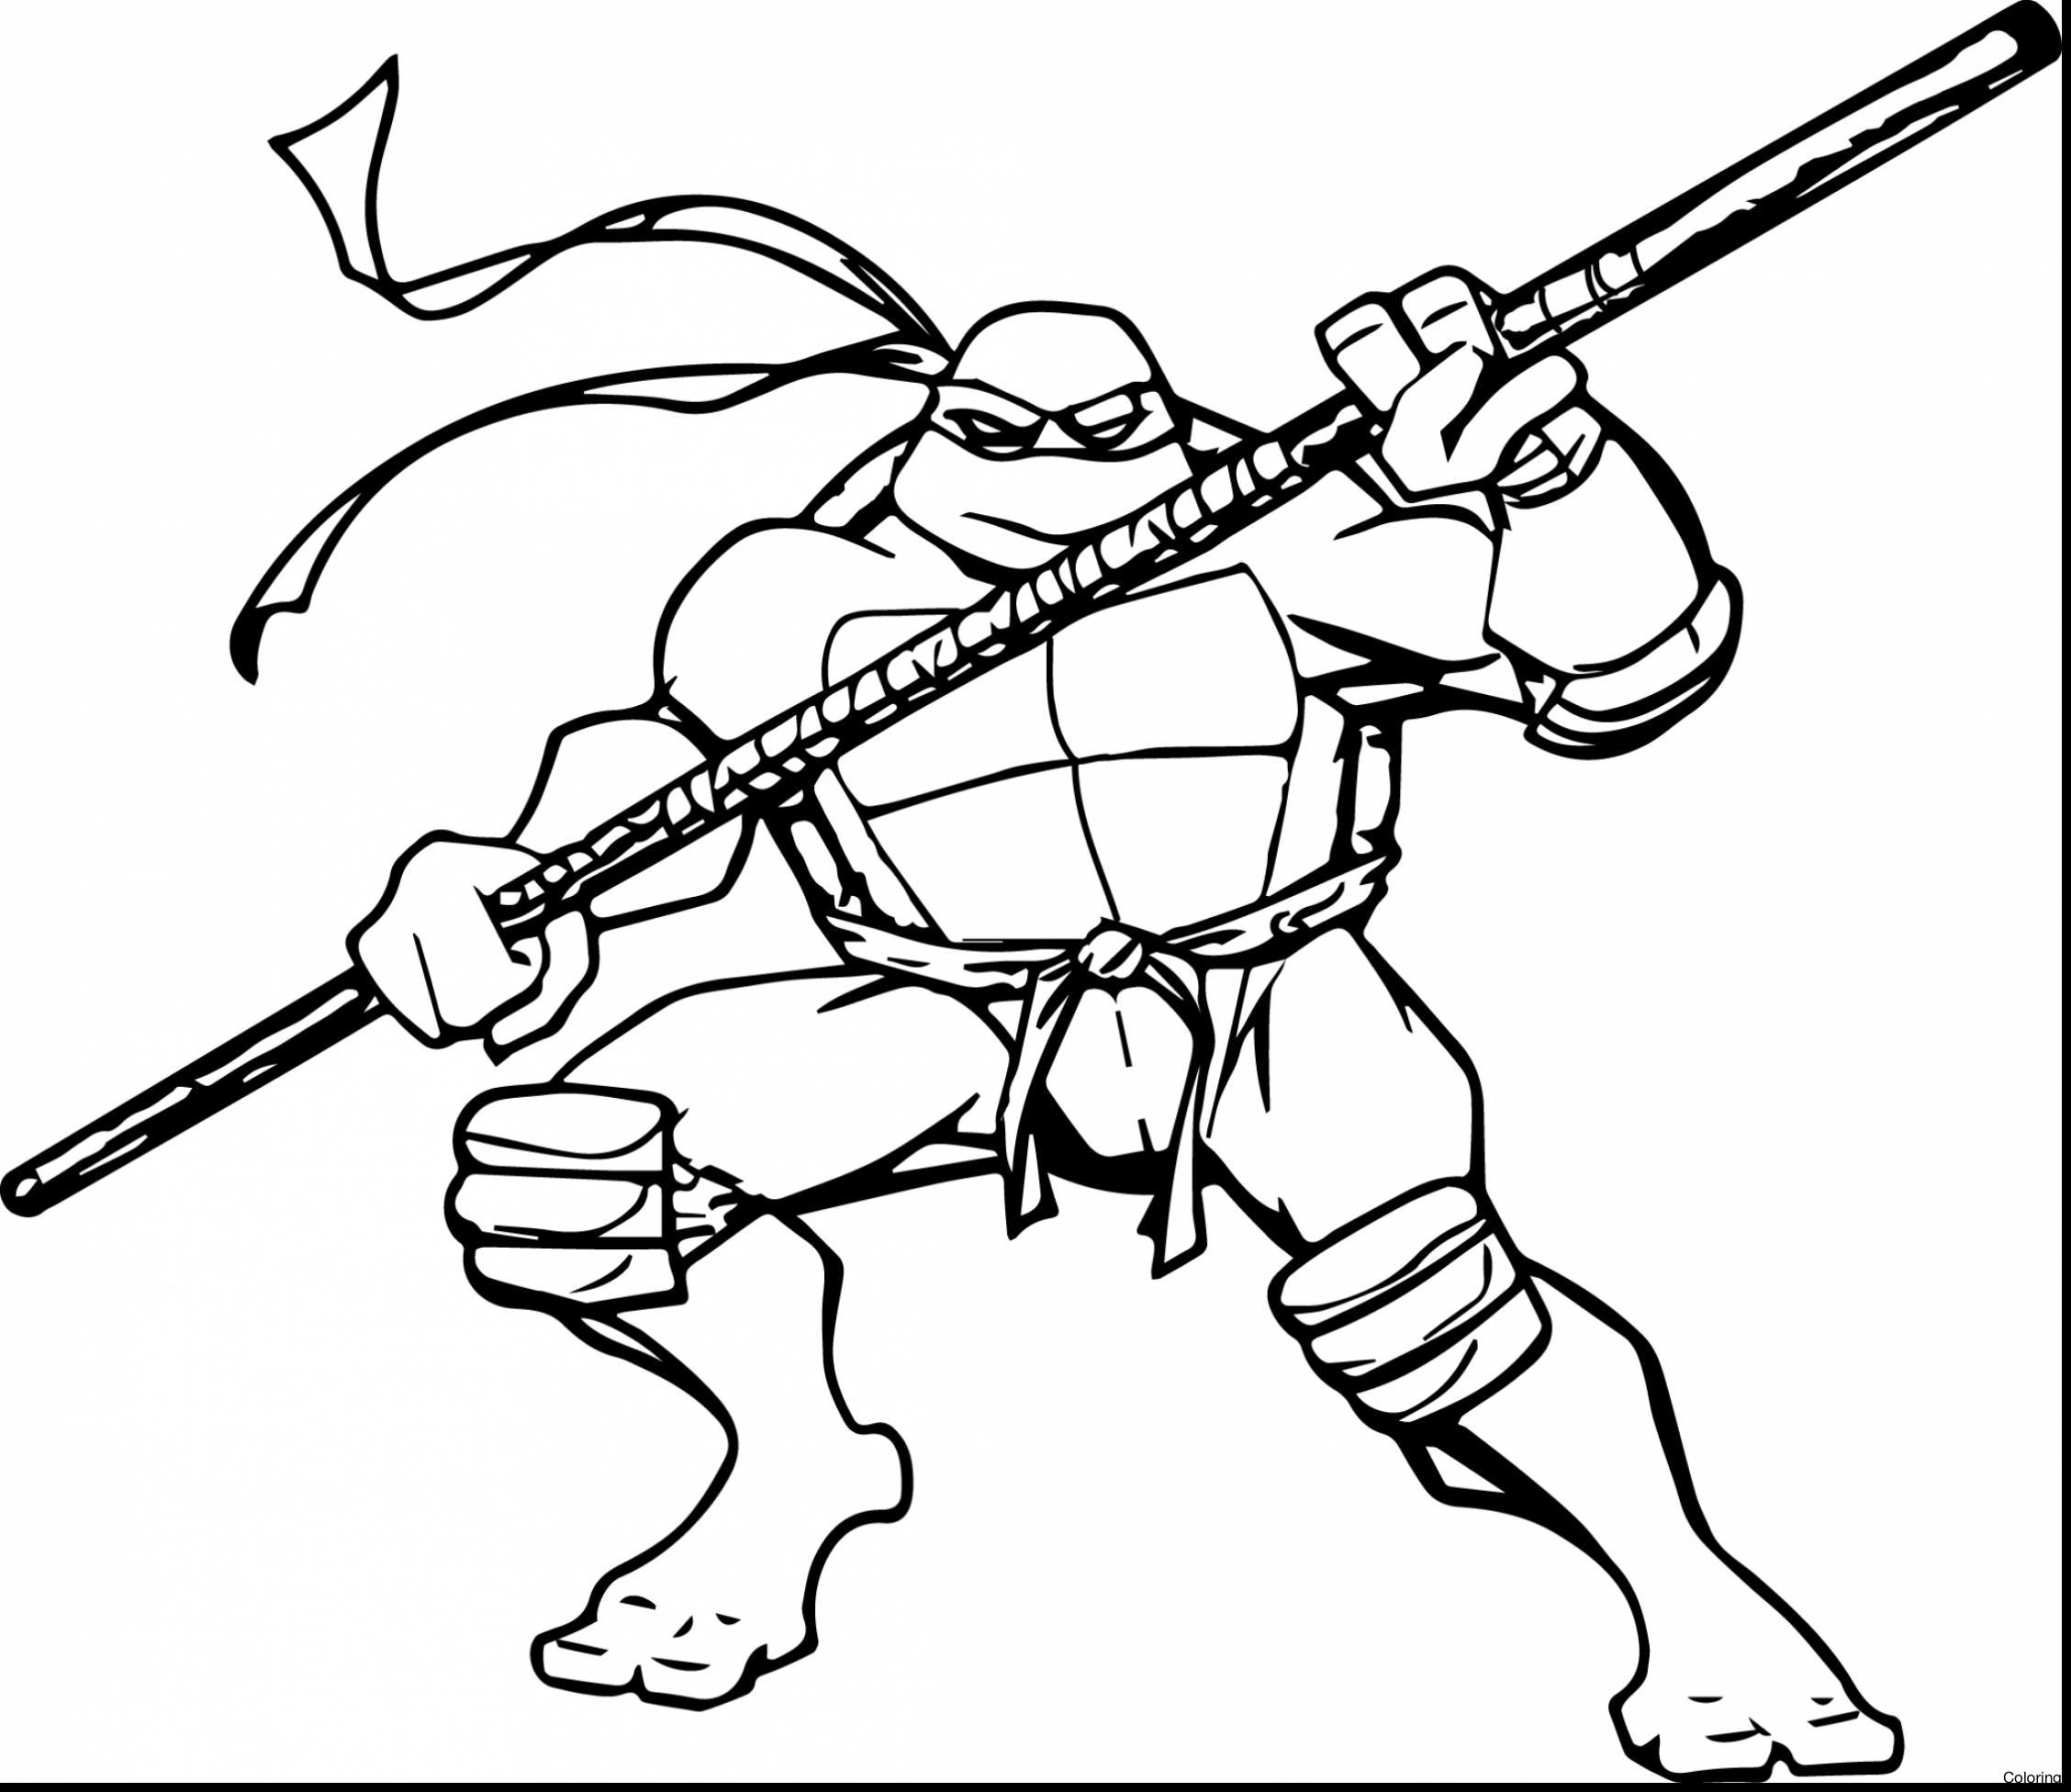 Donatello Drawing